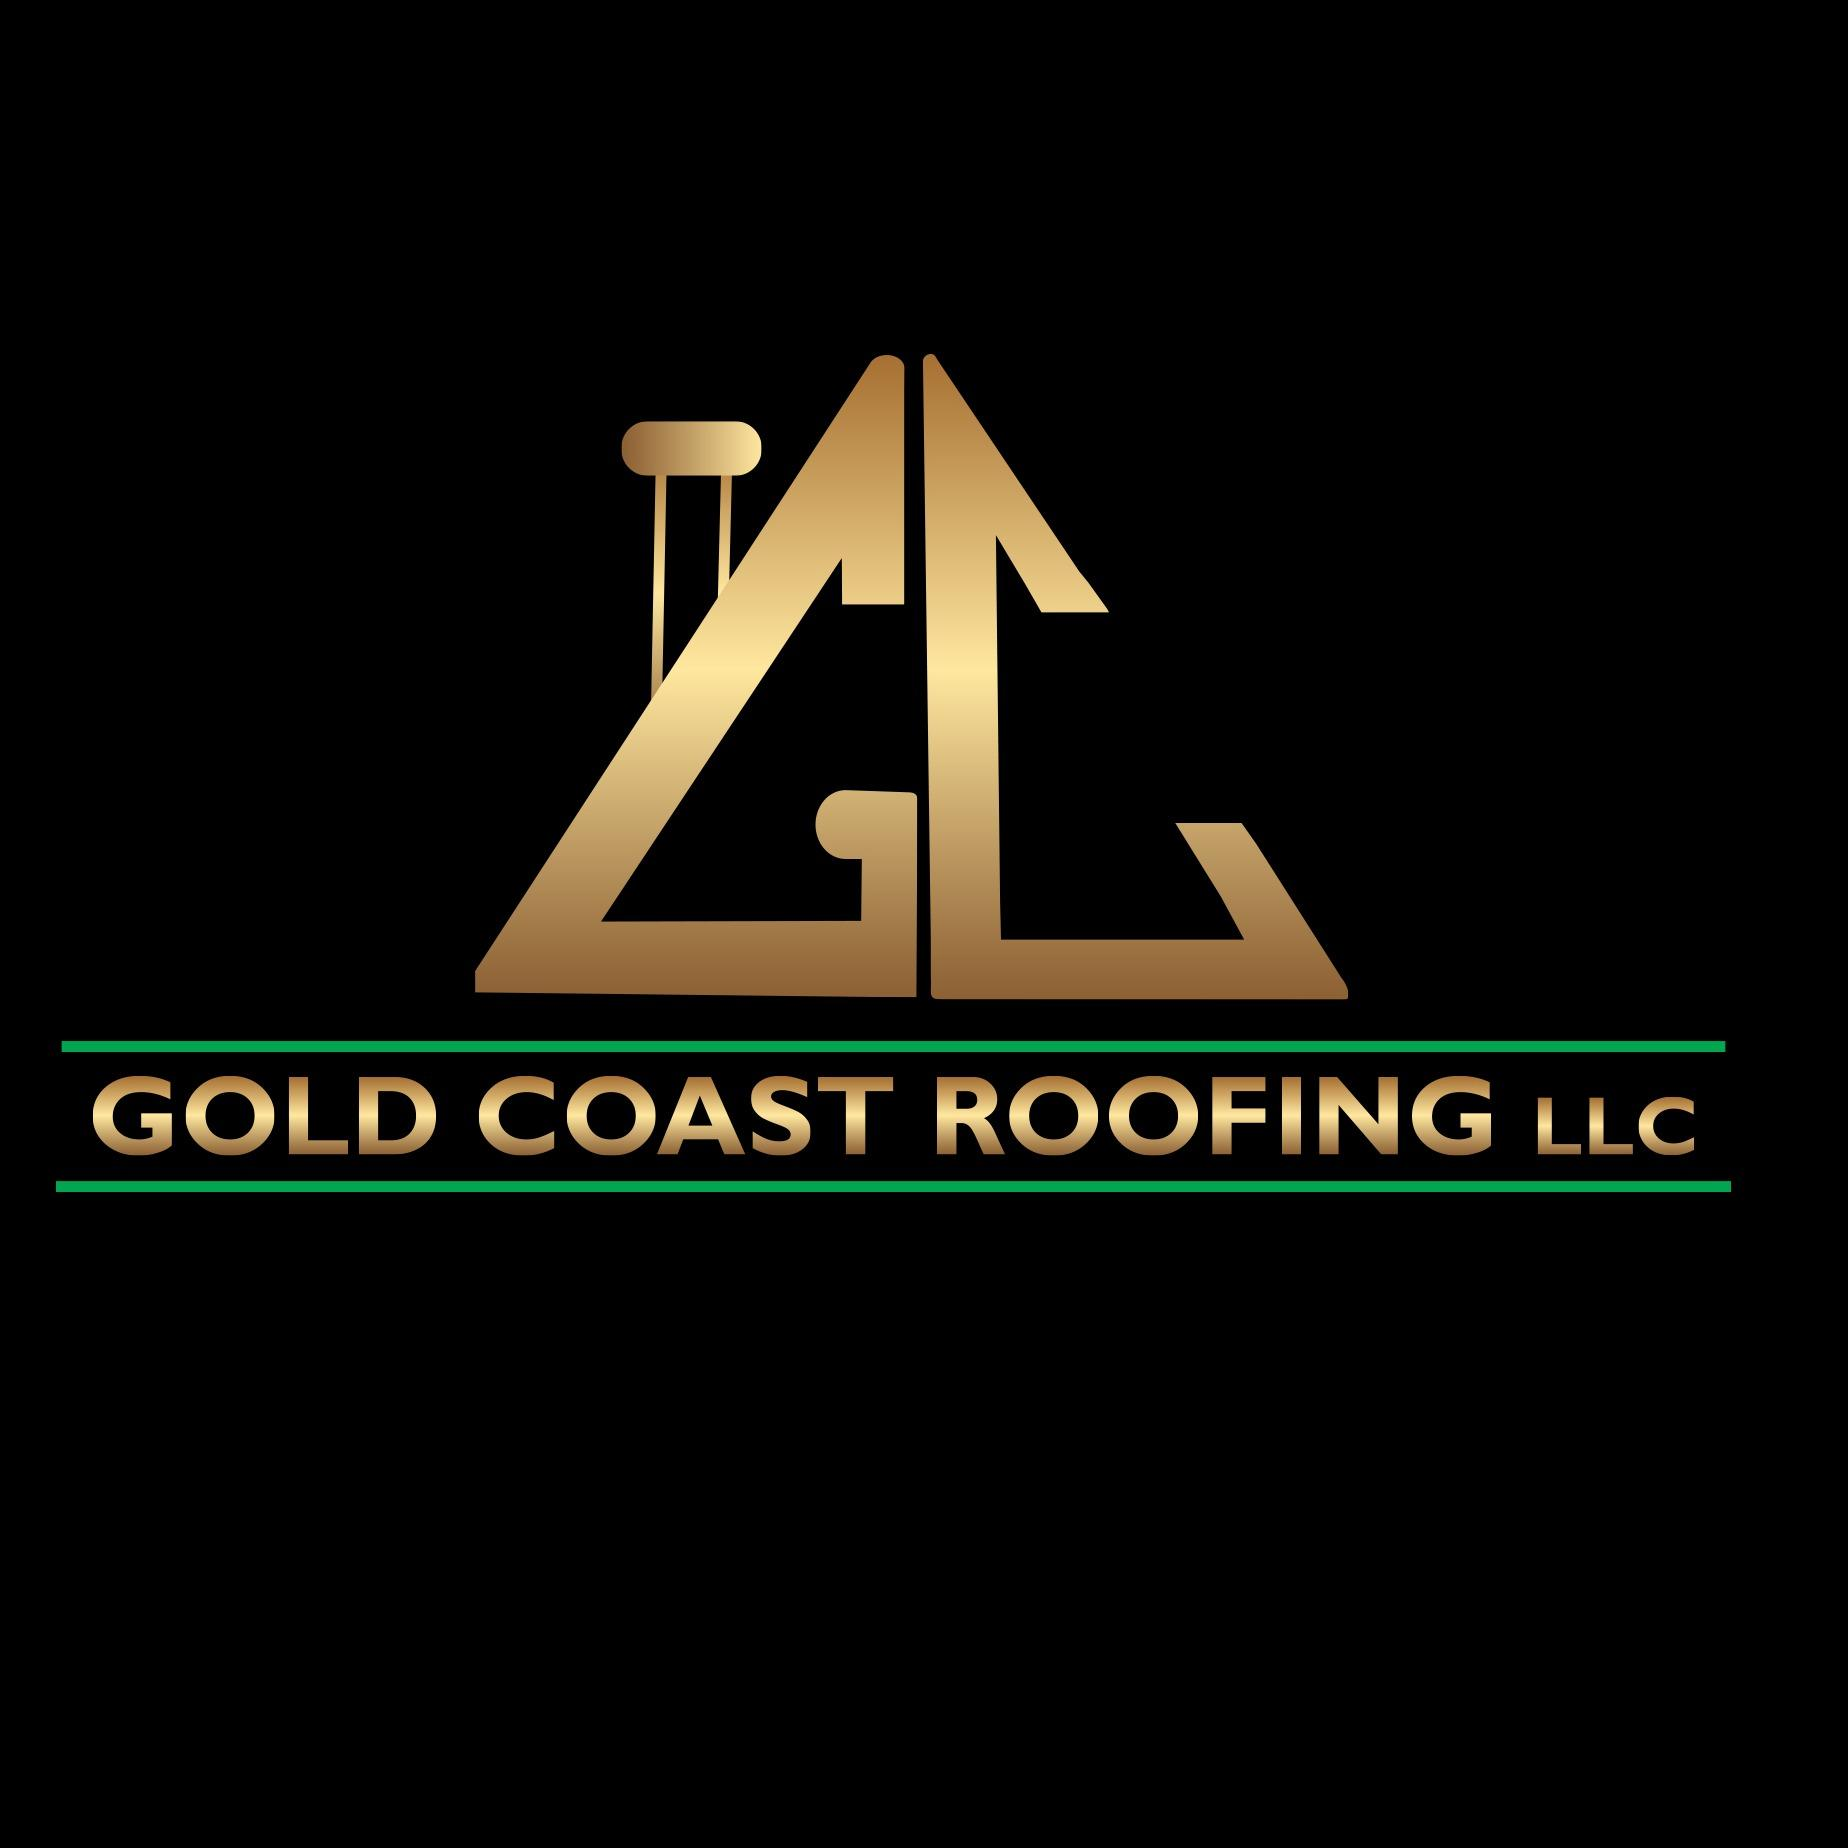 Gold Coast Roofing LLC